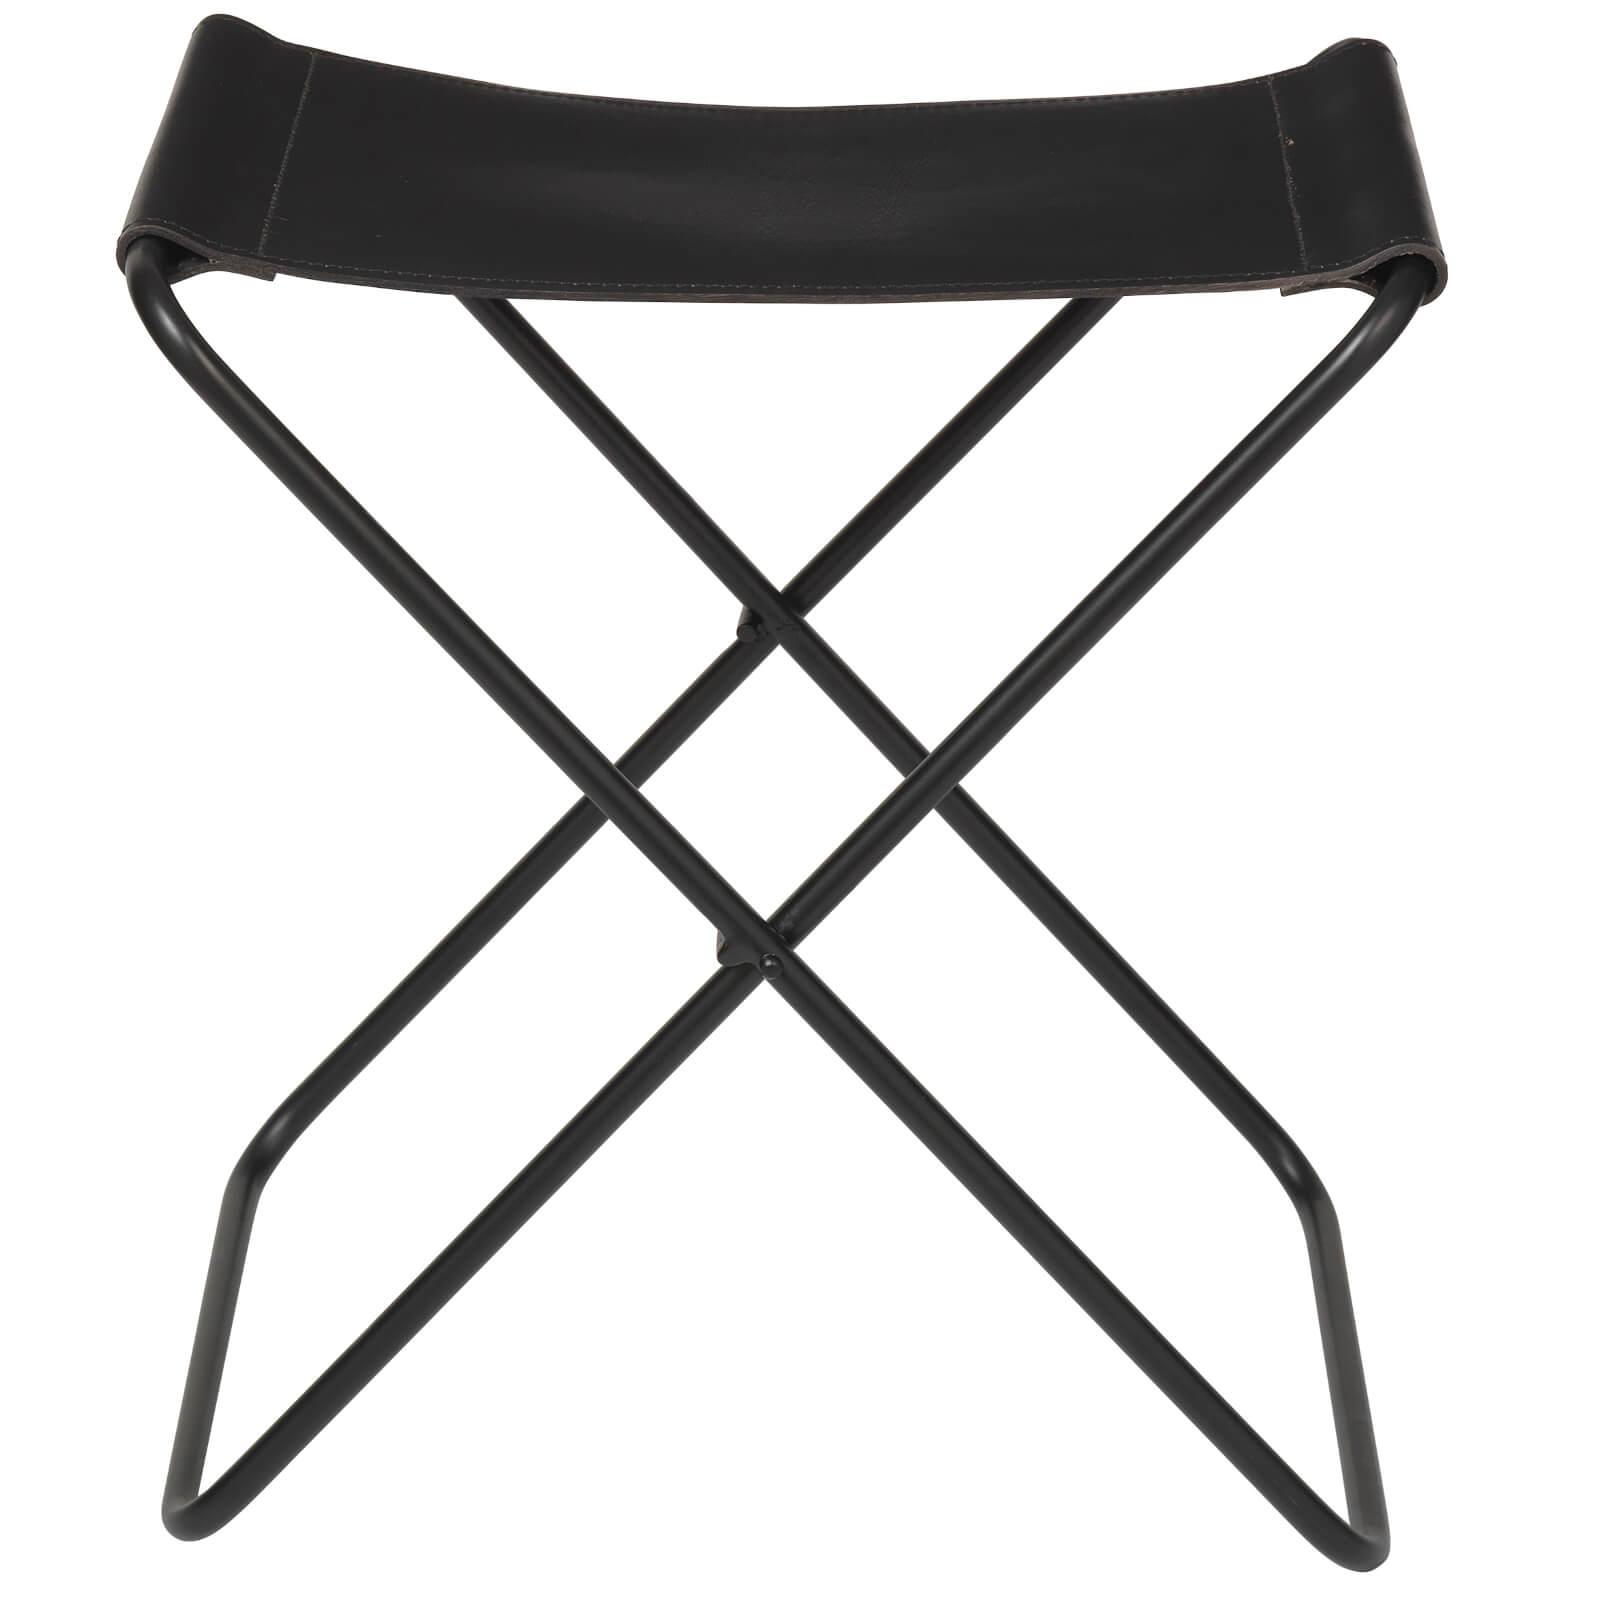 Broste Copenhagen Nola Leather Stool - Black